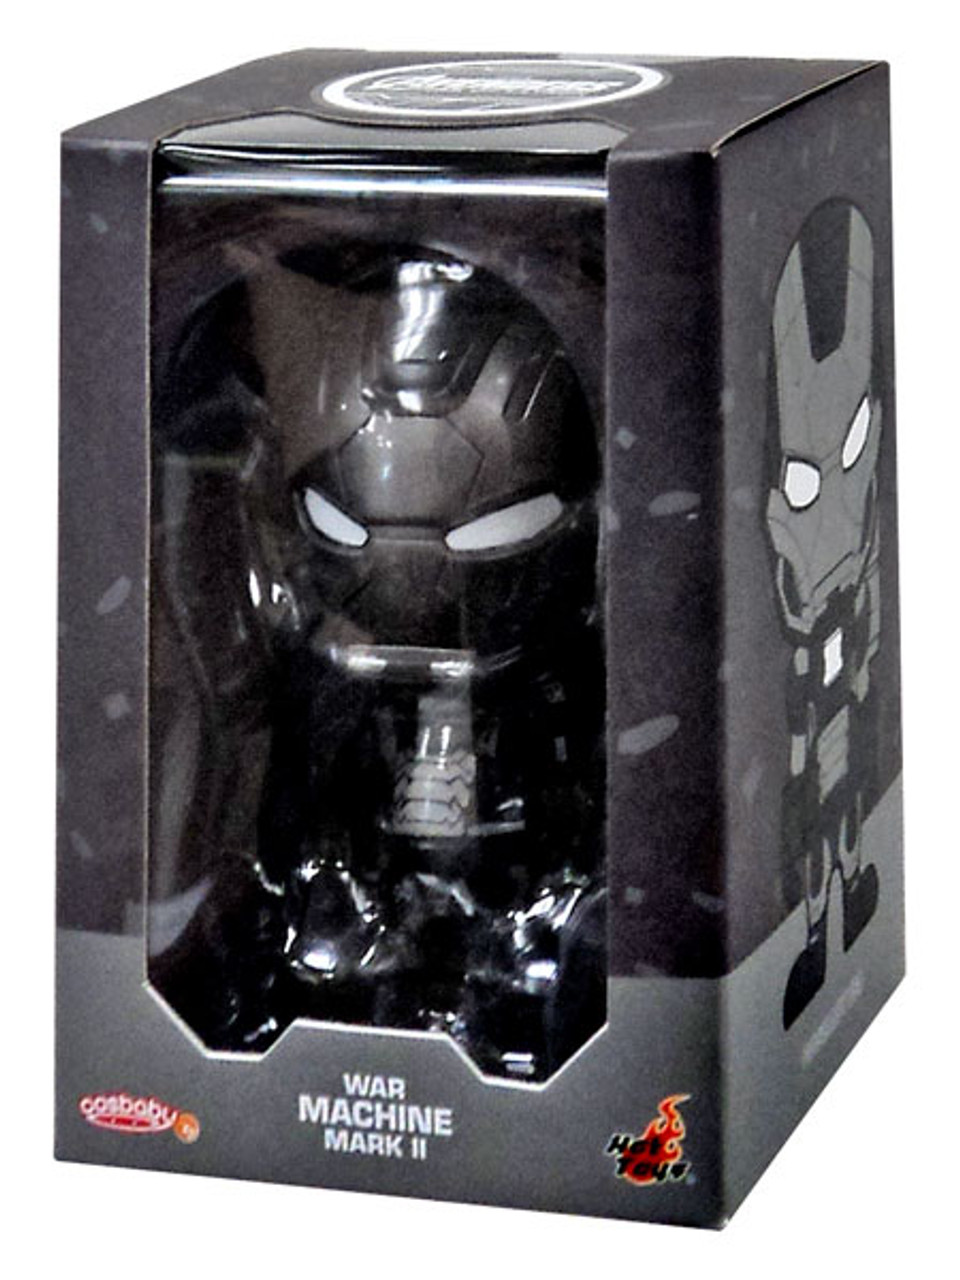 Marvel Avengers Age of Ultron Cosbaby Series 2 War Machine Mark II 3-Inch Mini Figure